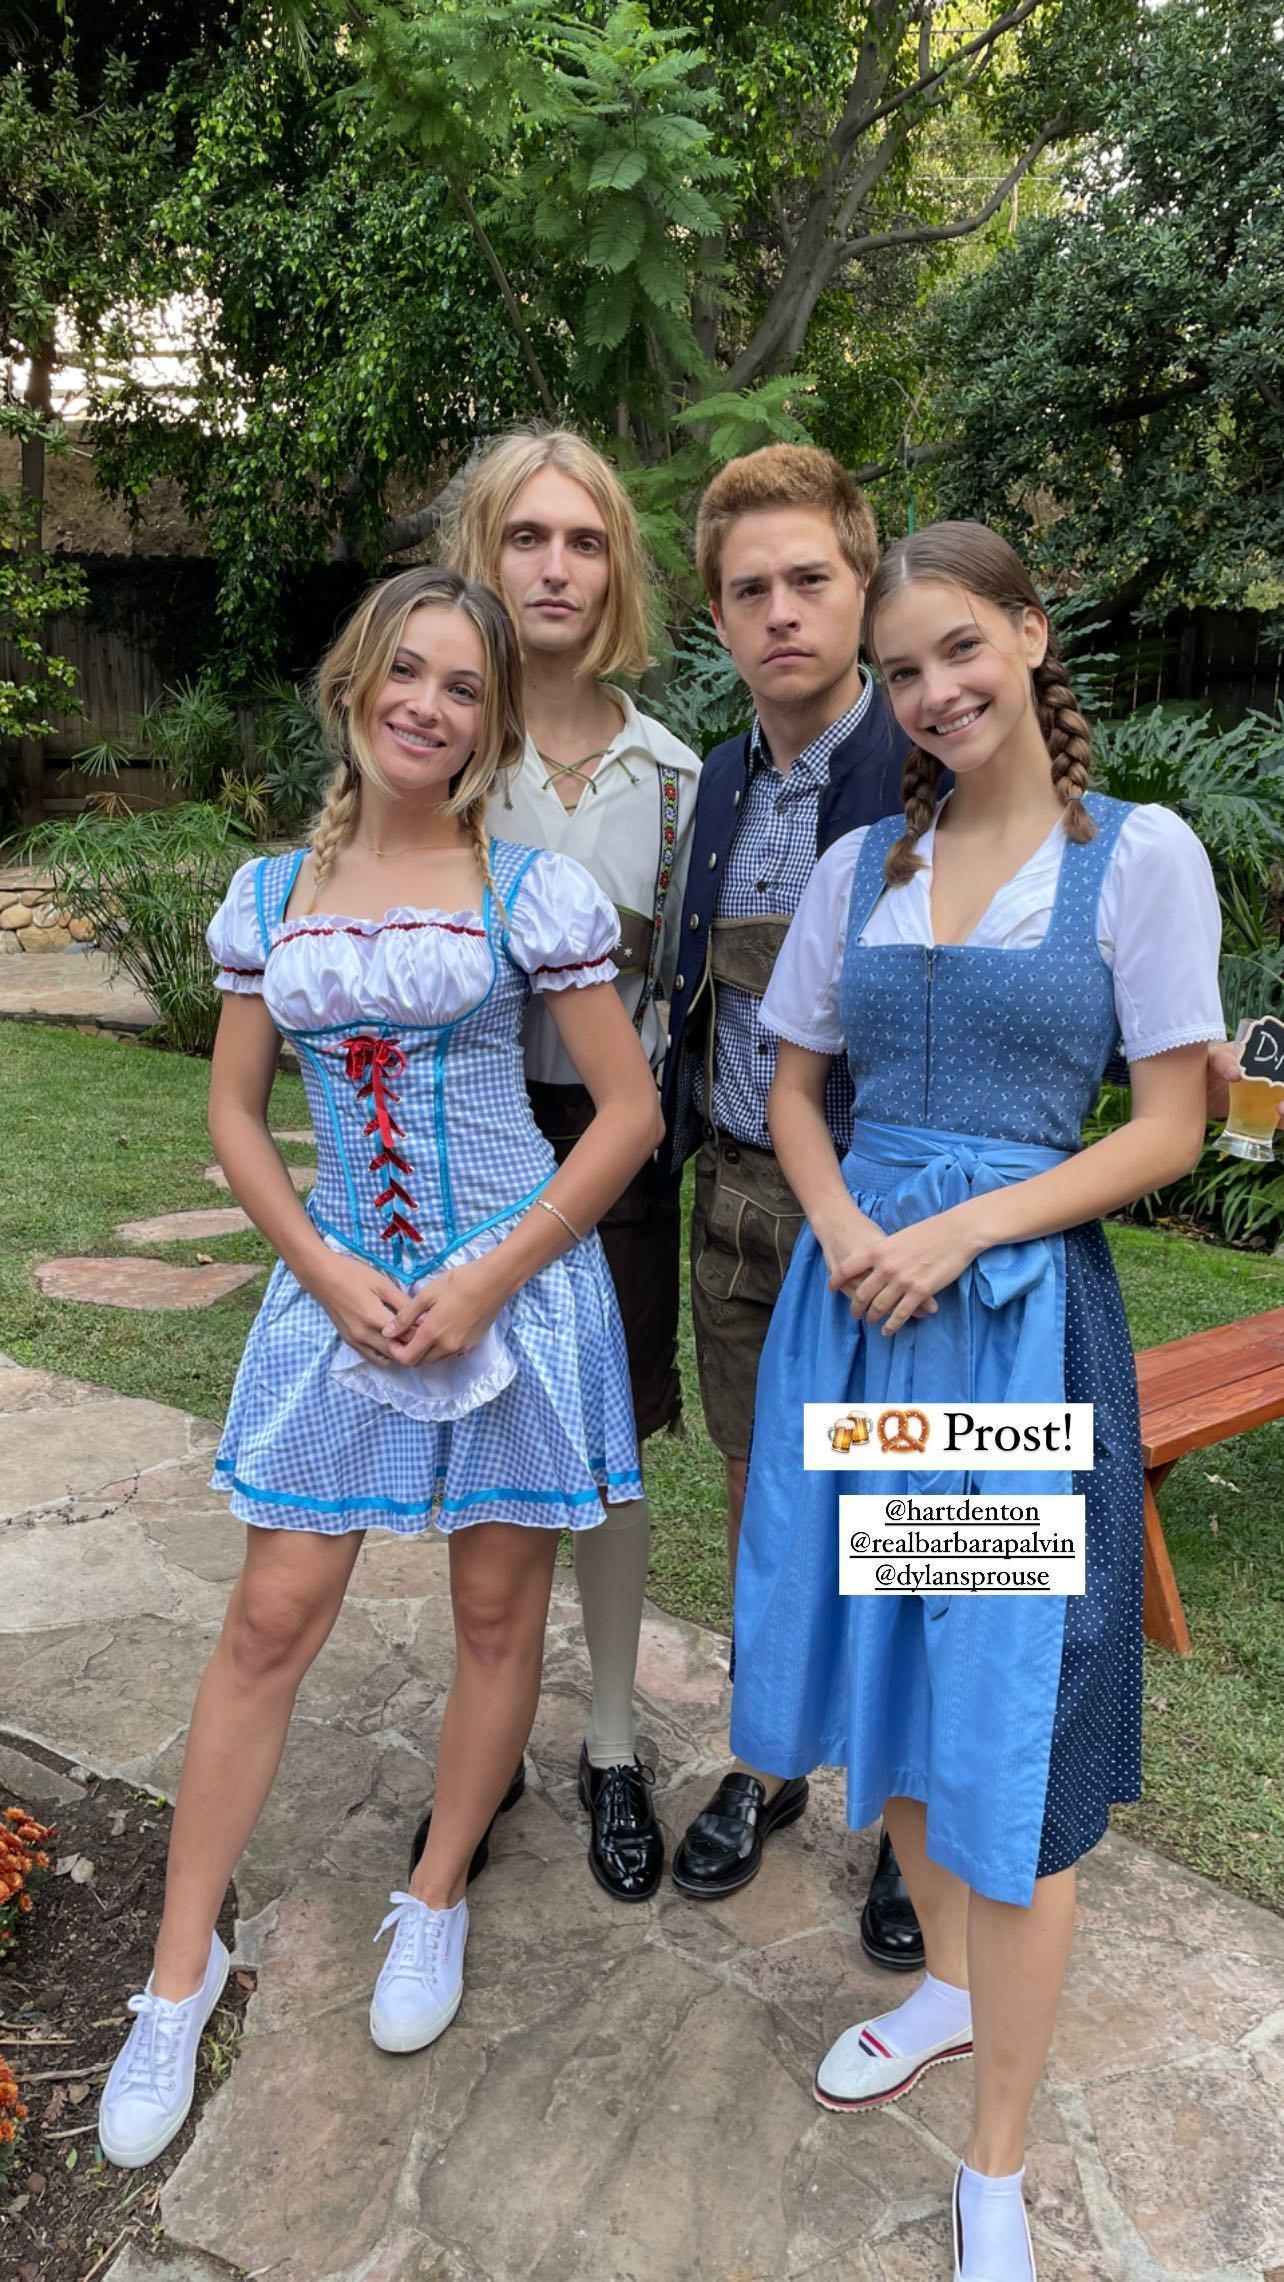 L?anniversaire de Barbara Palvin à l?Oktoberfest! - Photo 5